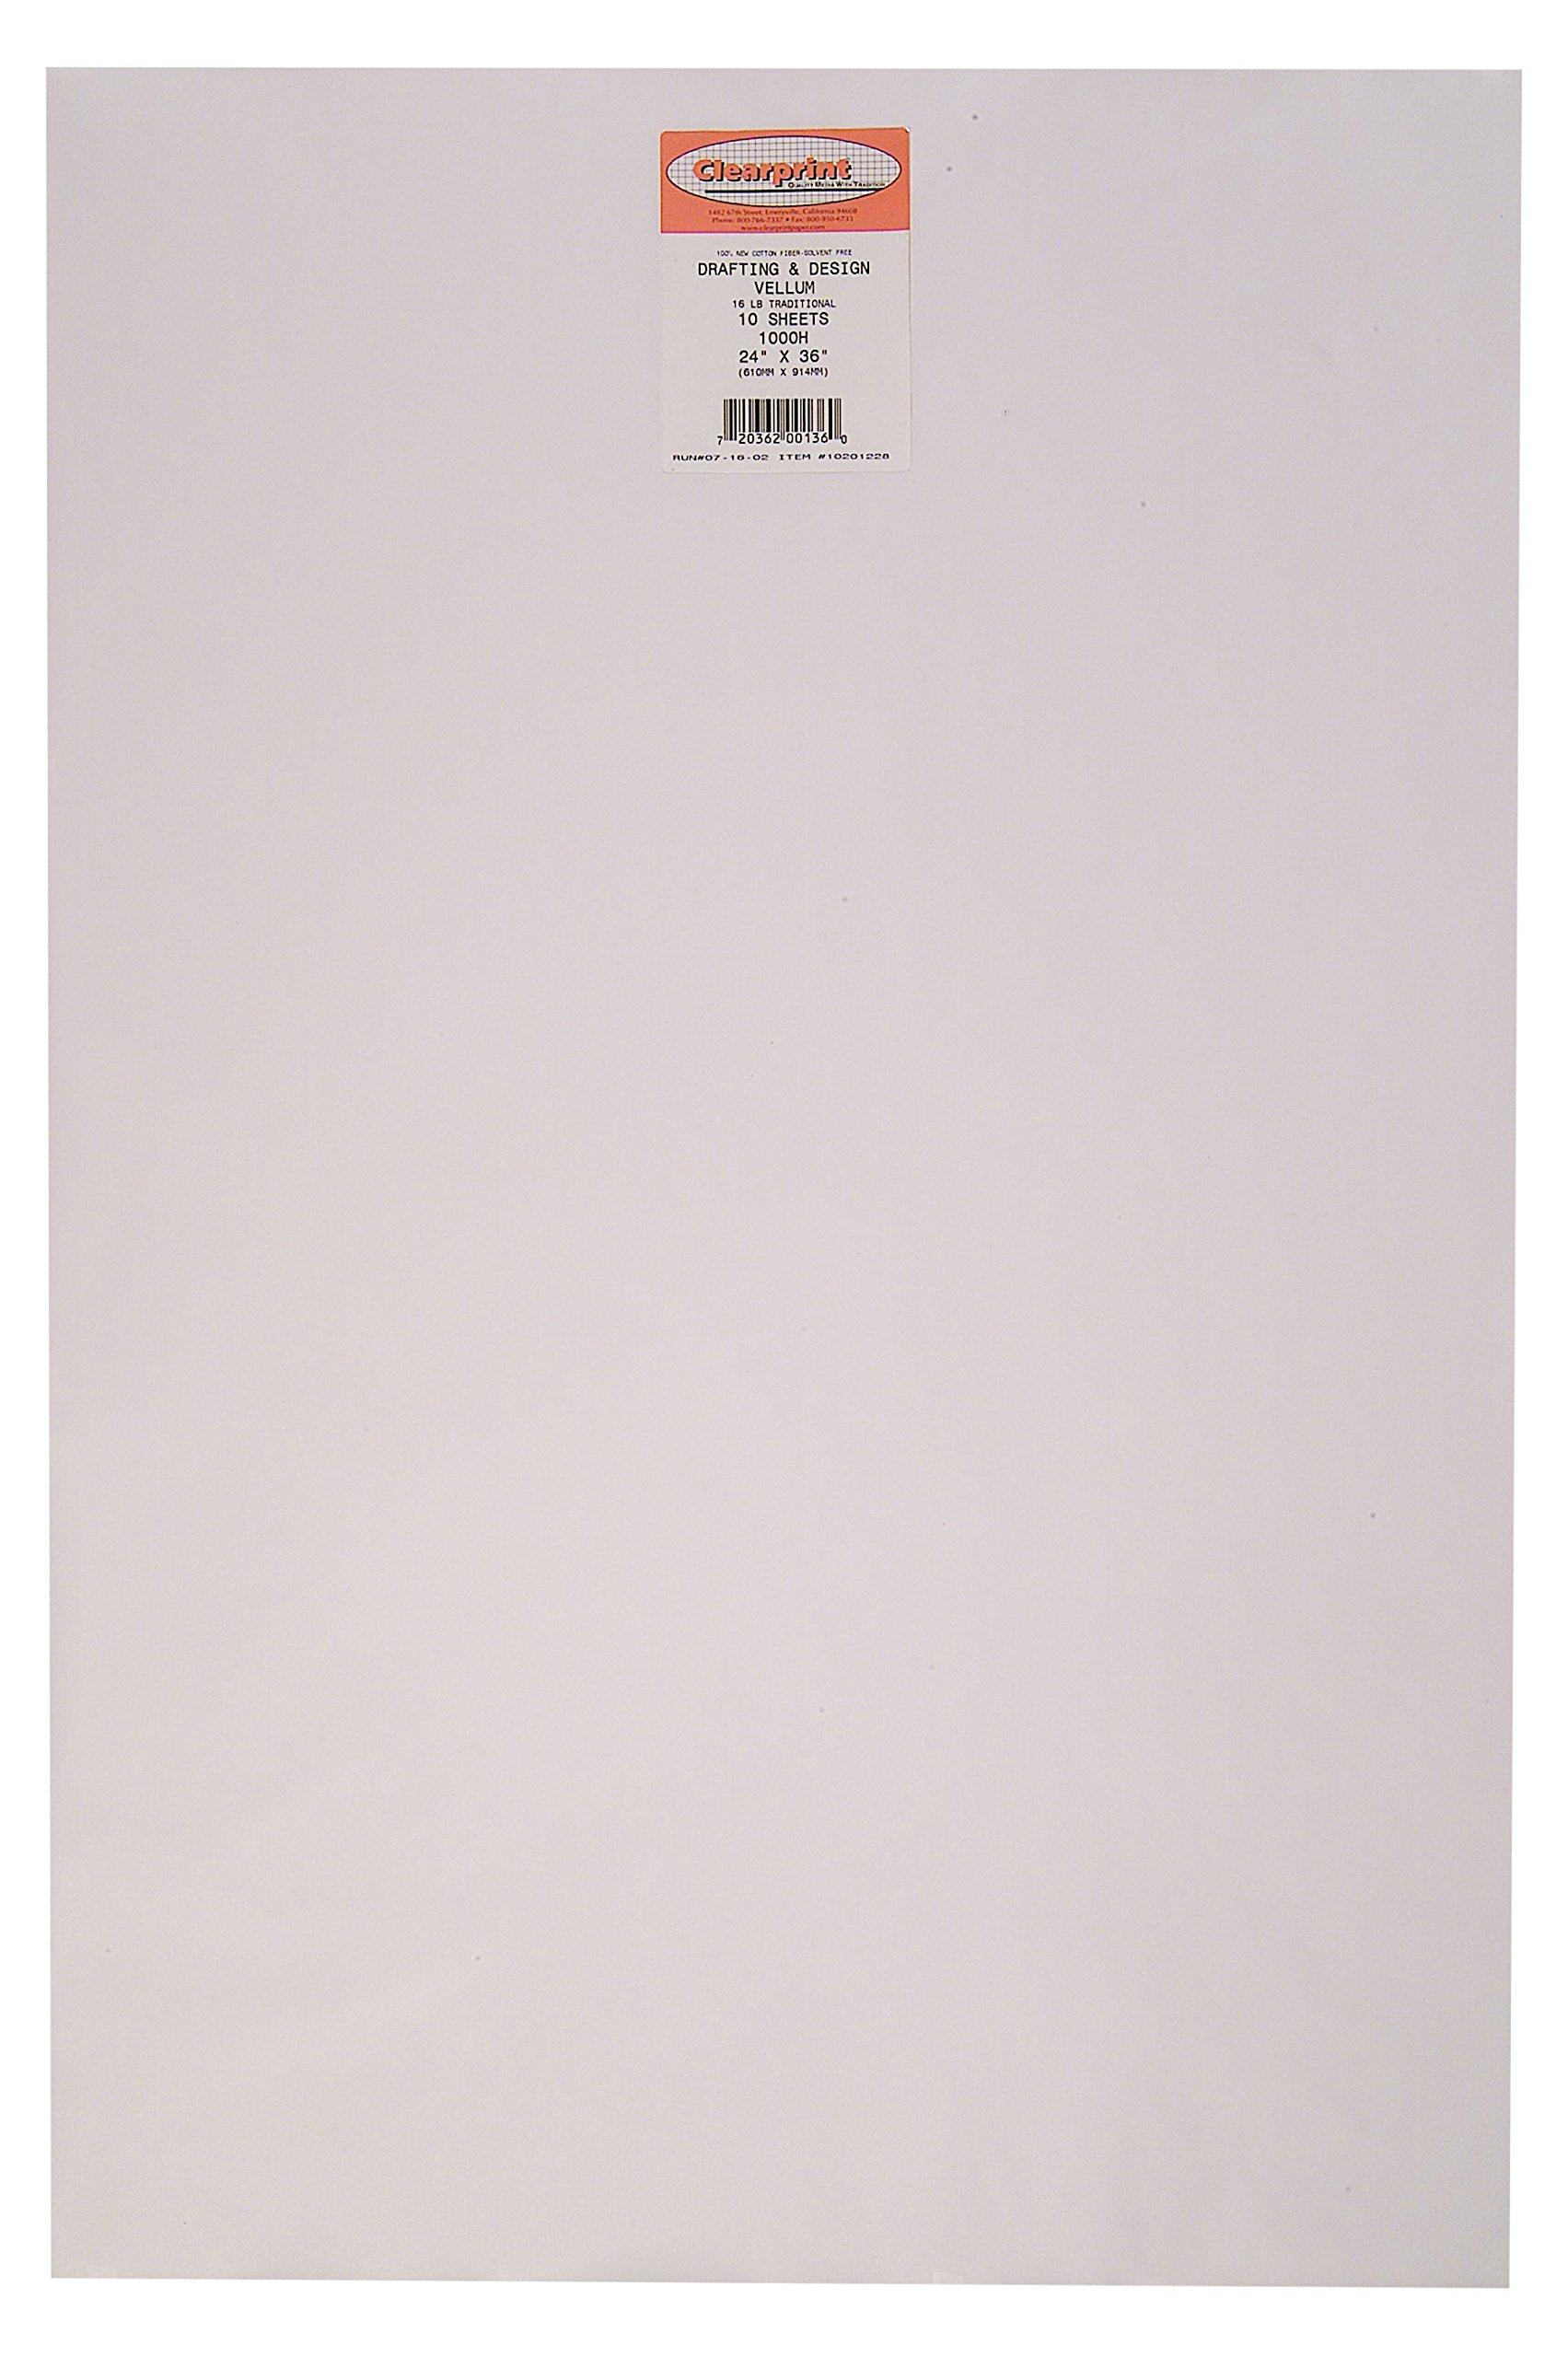 Clearprint 1000H Design Vellum Sheets, 16 lb., 100% Cotton, 24 x 36 Inches, 10 Sheets Per Pack, Translucent White, 1 Each (10201228)